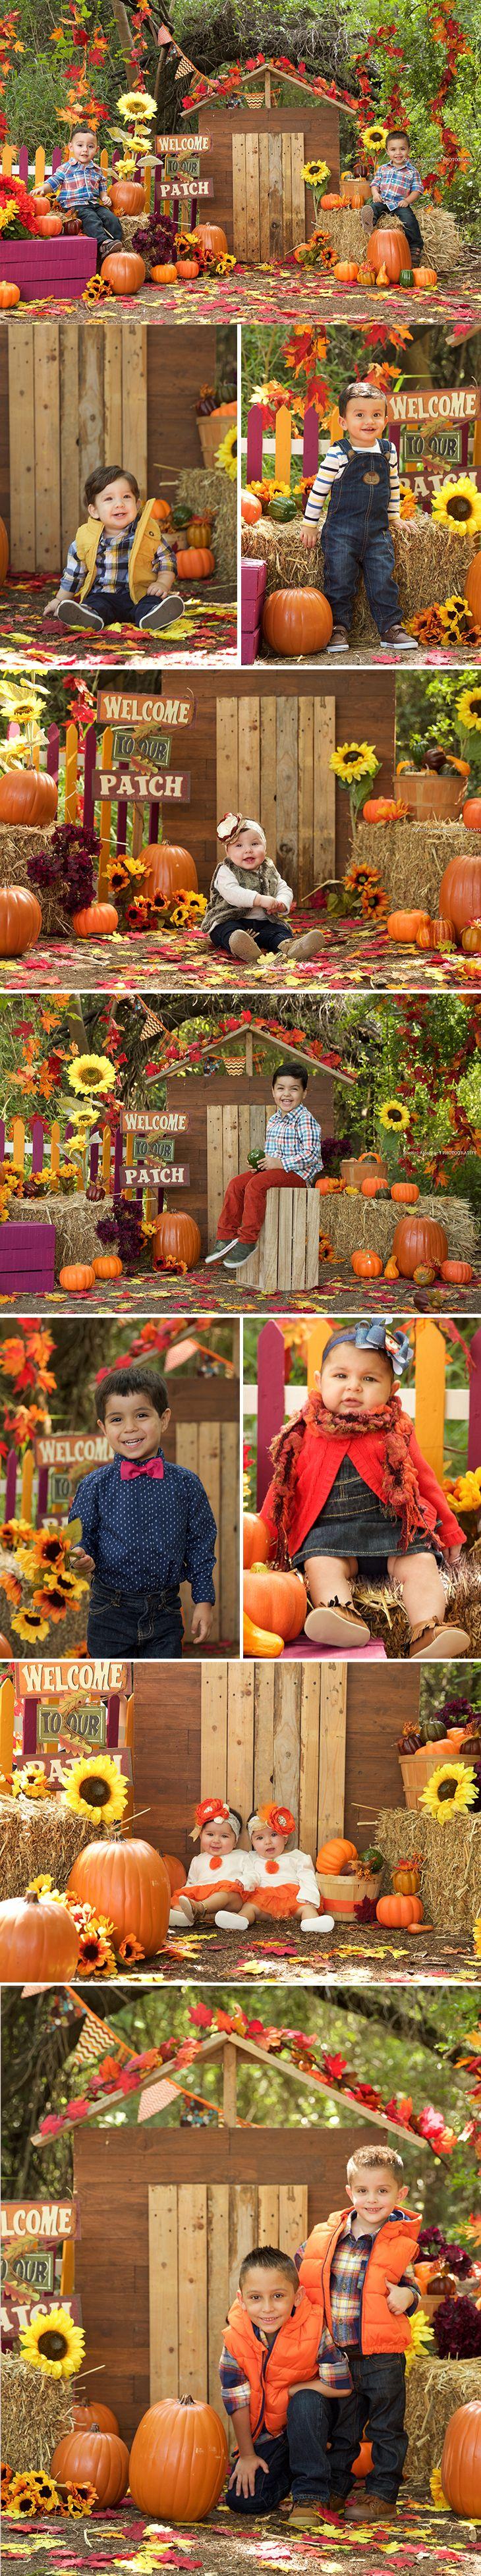 Fall Mini Session, Fall, Mini Session, Ideas, Fall Mini Session Set, Pumpkins,